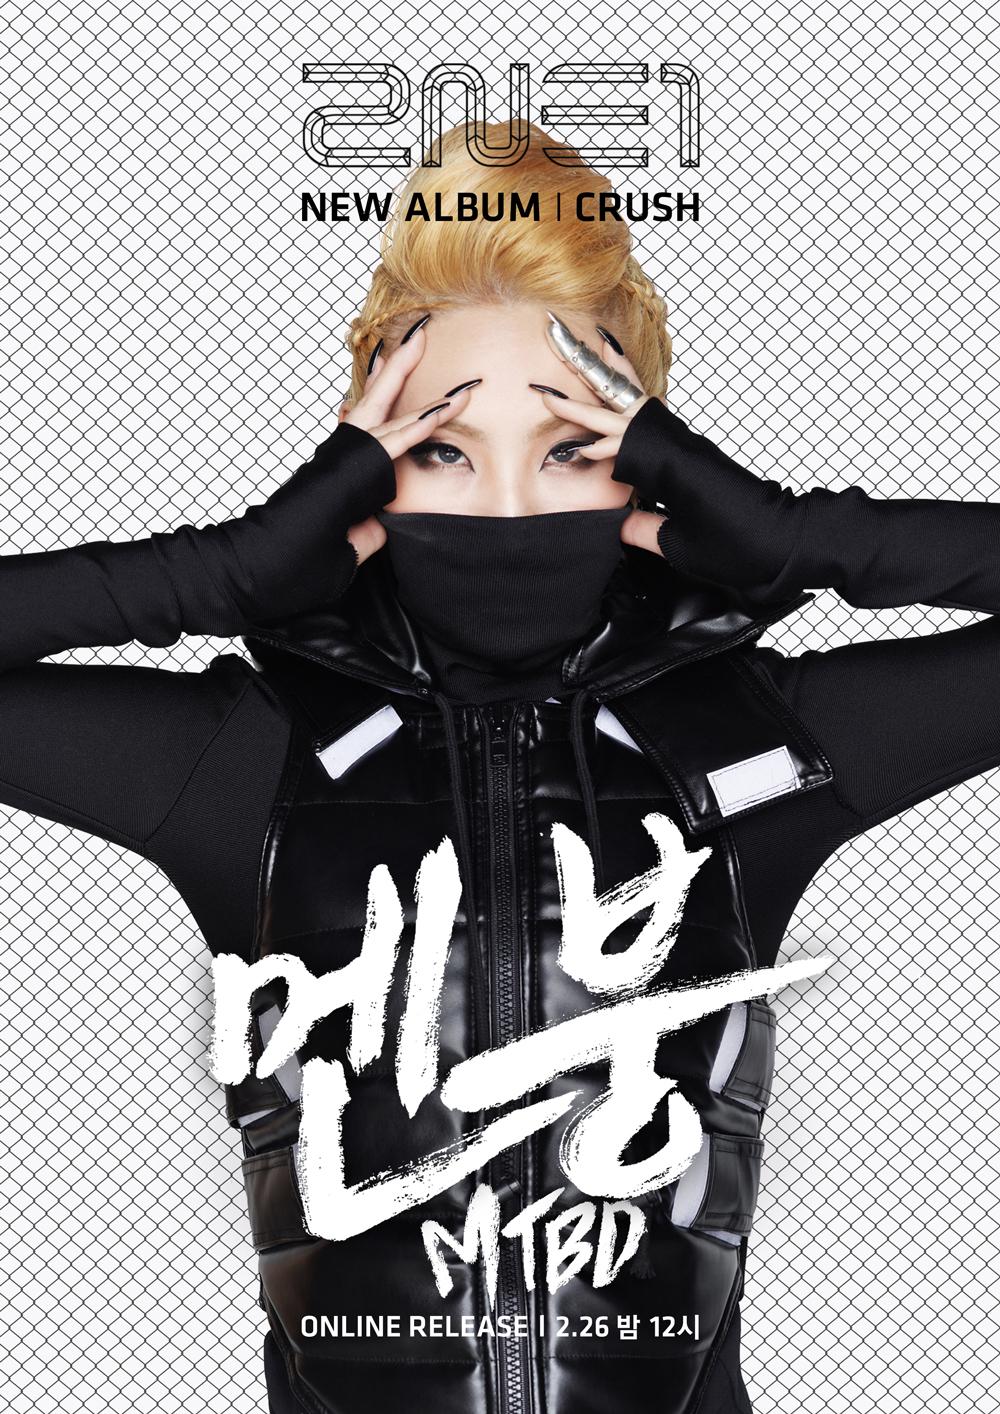 CL profile image